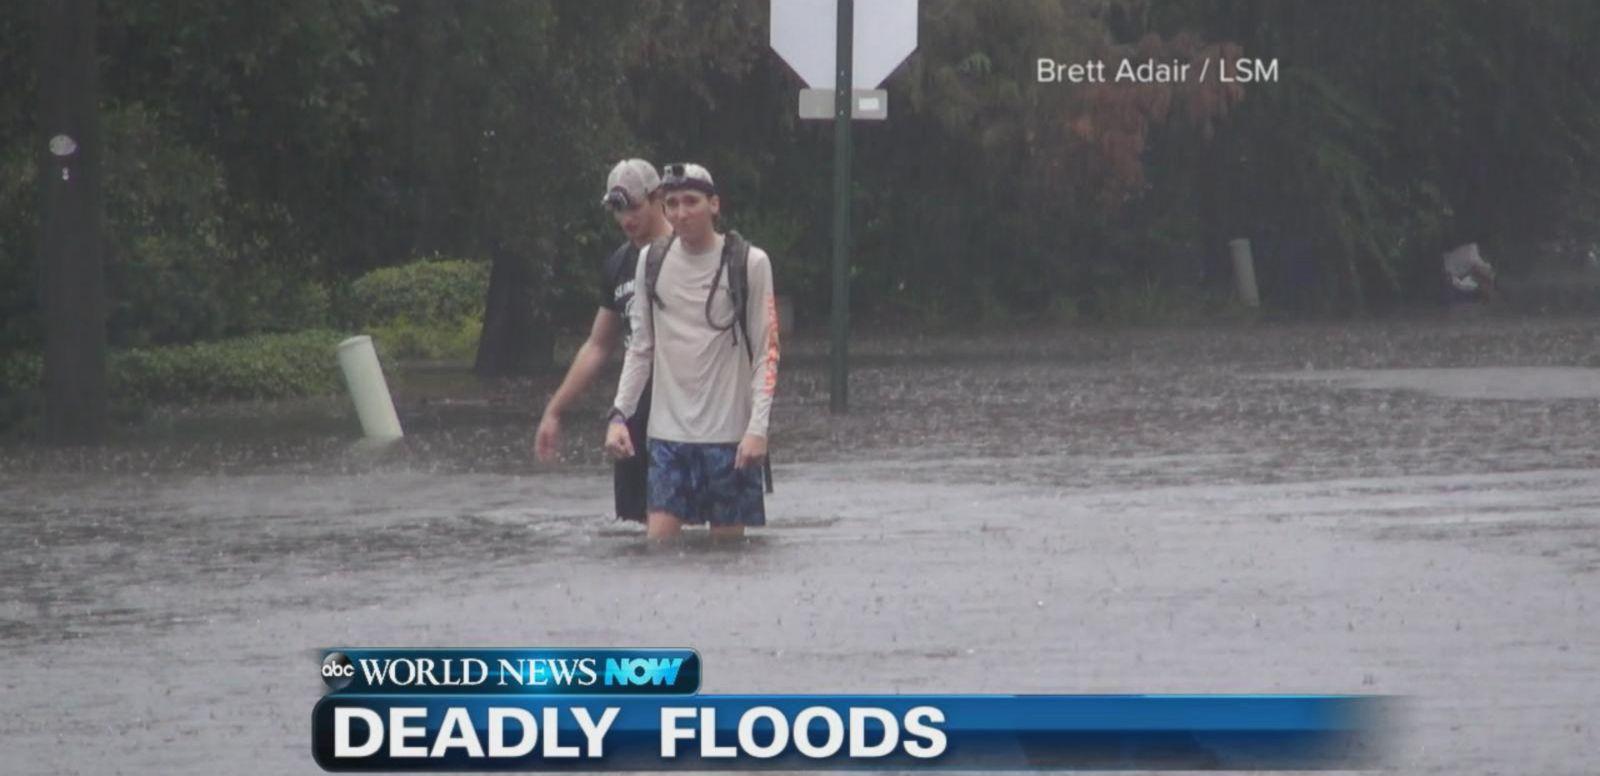 VIDEO: The South Carolina coast battles severe flooding killing 7 people.